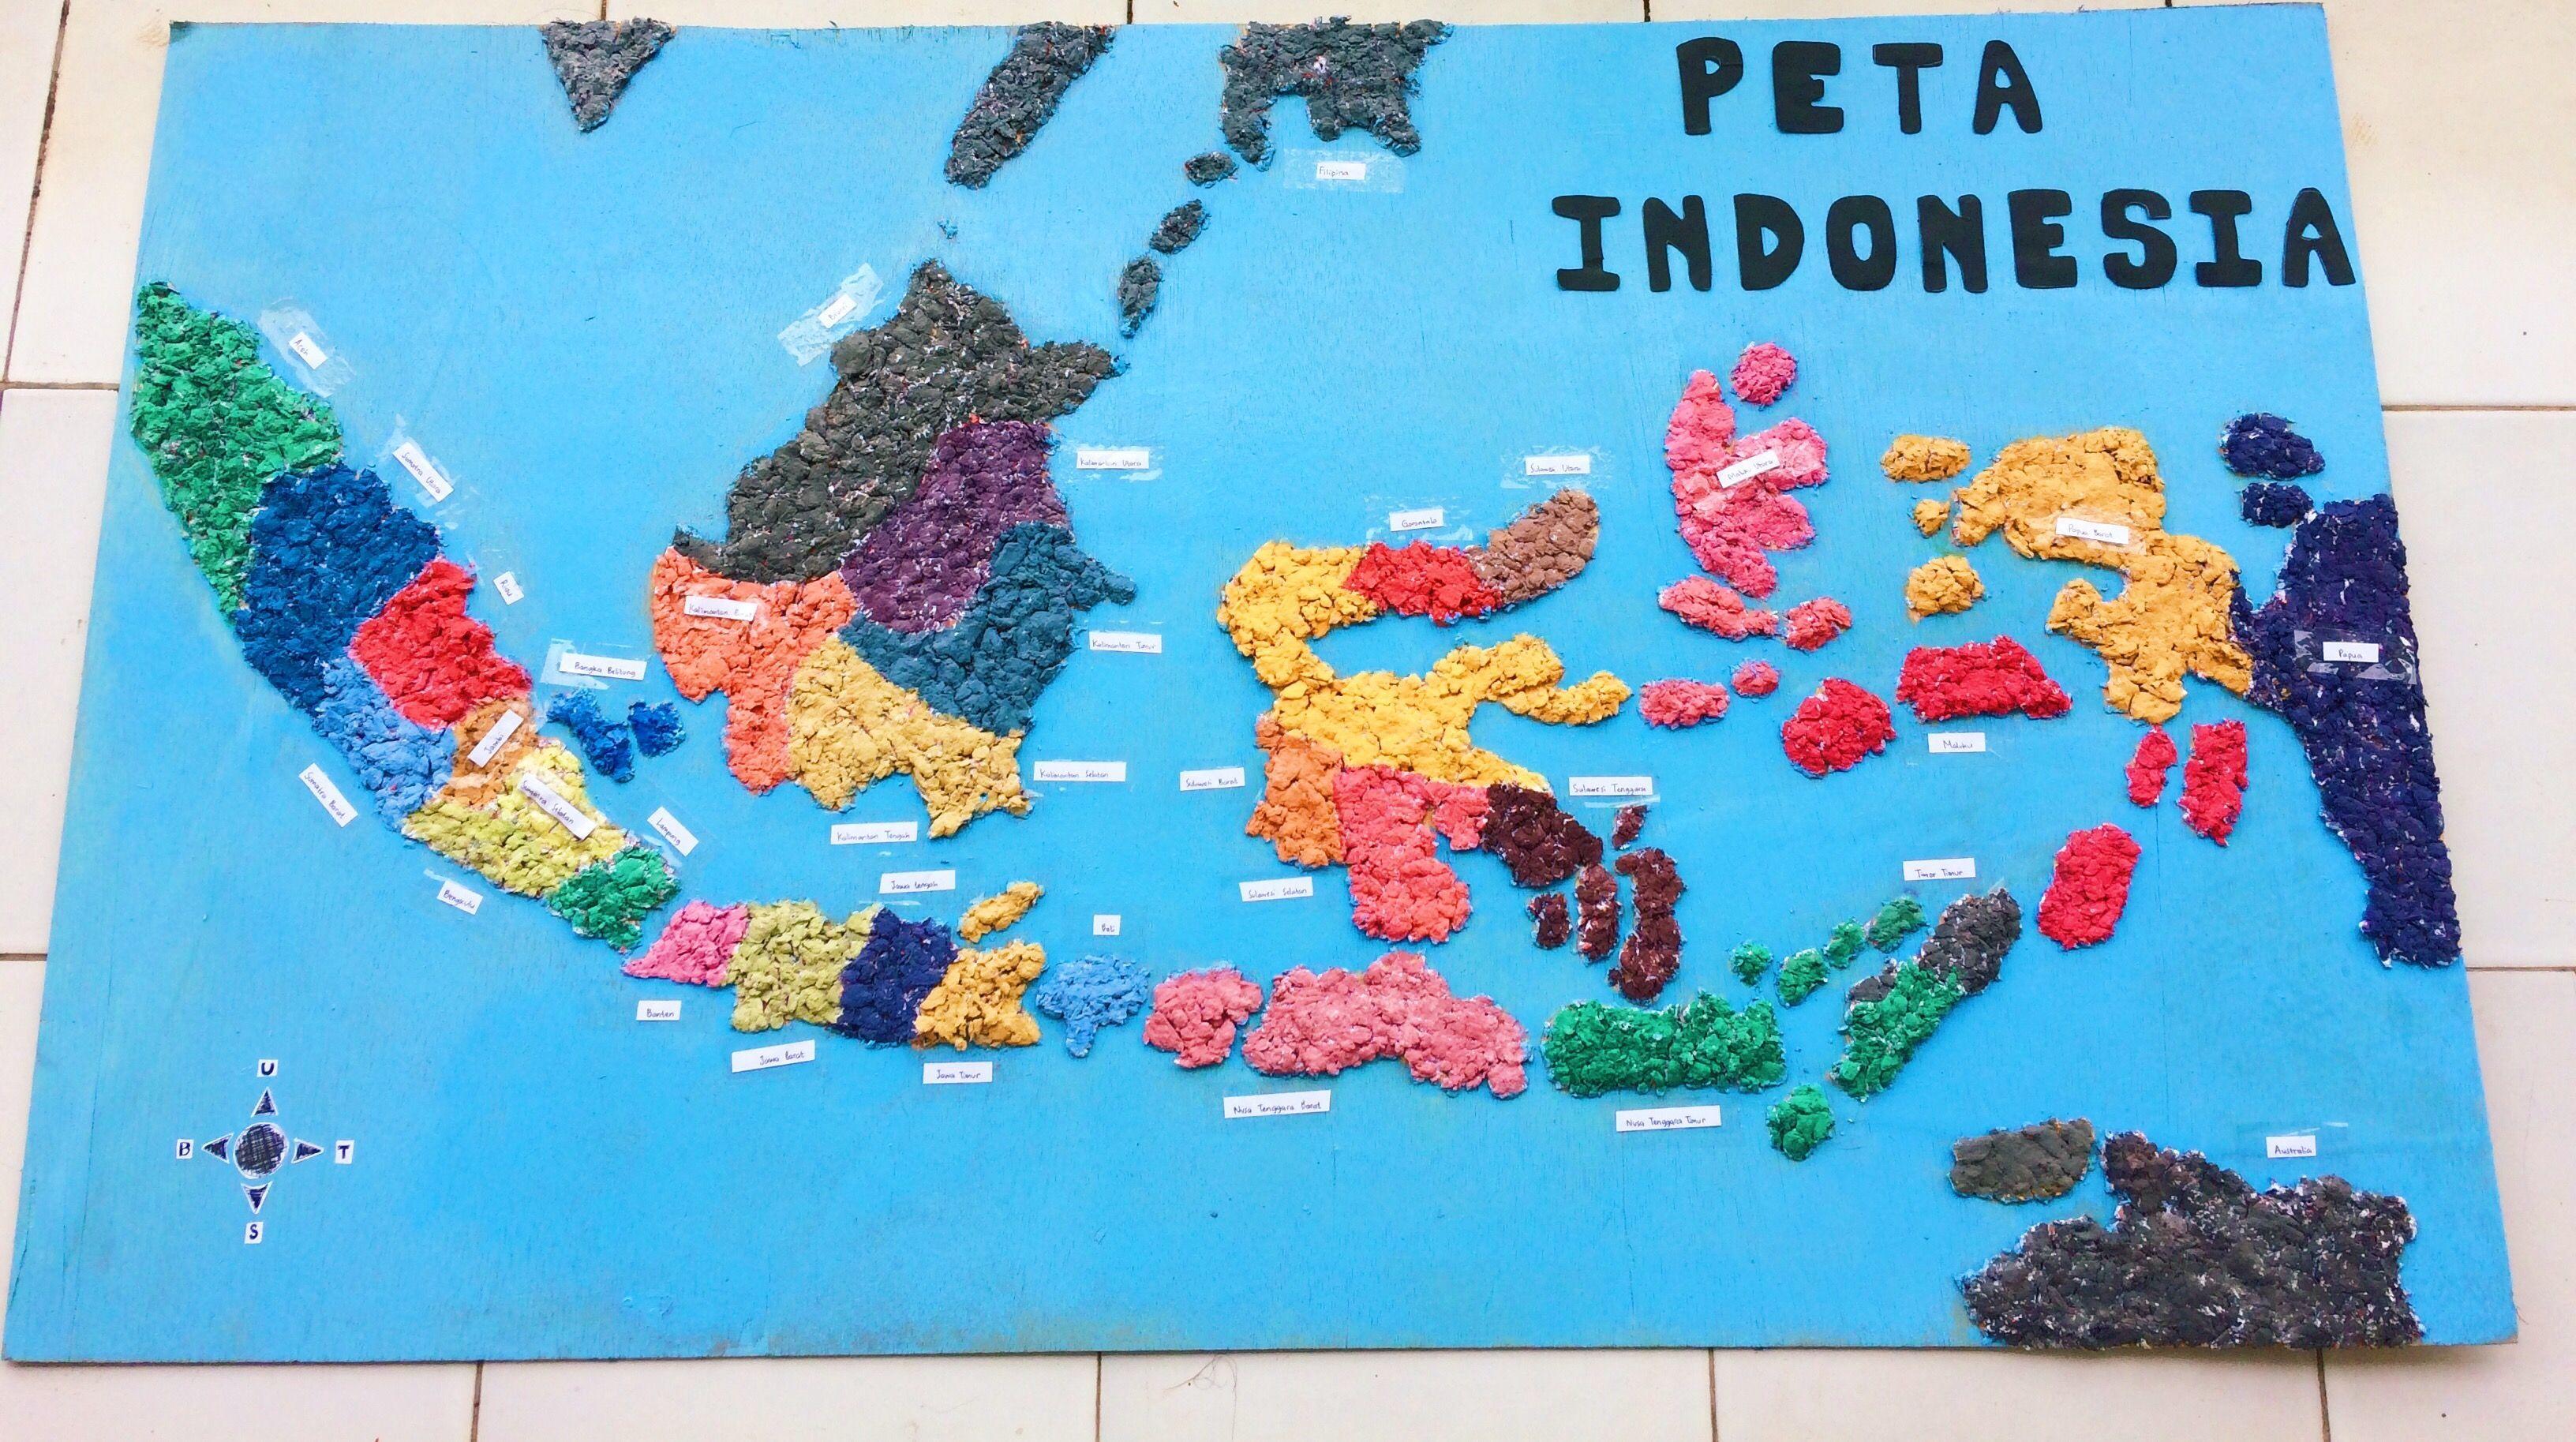 Peta Indonesia dan Berbagai Keragaman di Dalamnya Peta